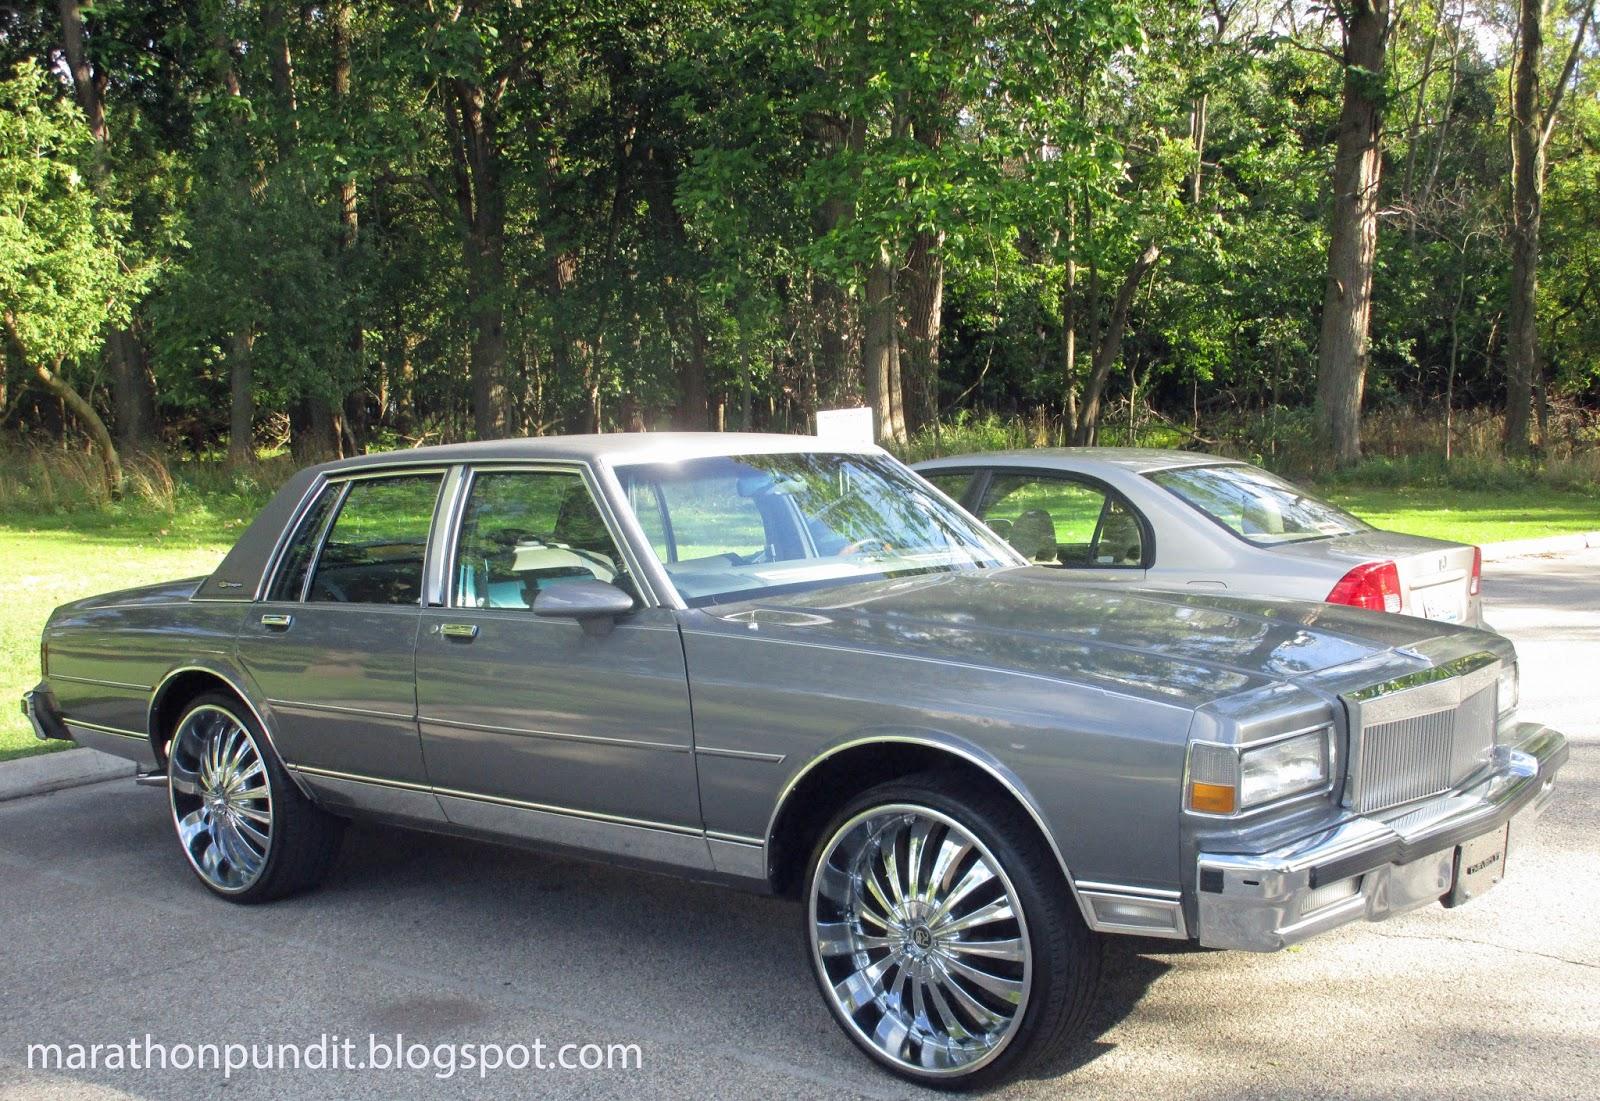 marathon pundit classic car 1989 chevy caprice classic. Black Bedroom Furniture Sets. Home Design Ideas